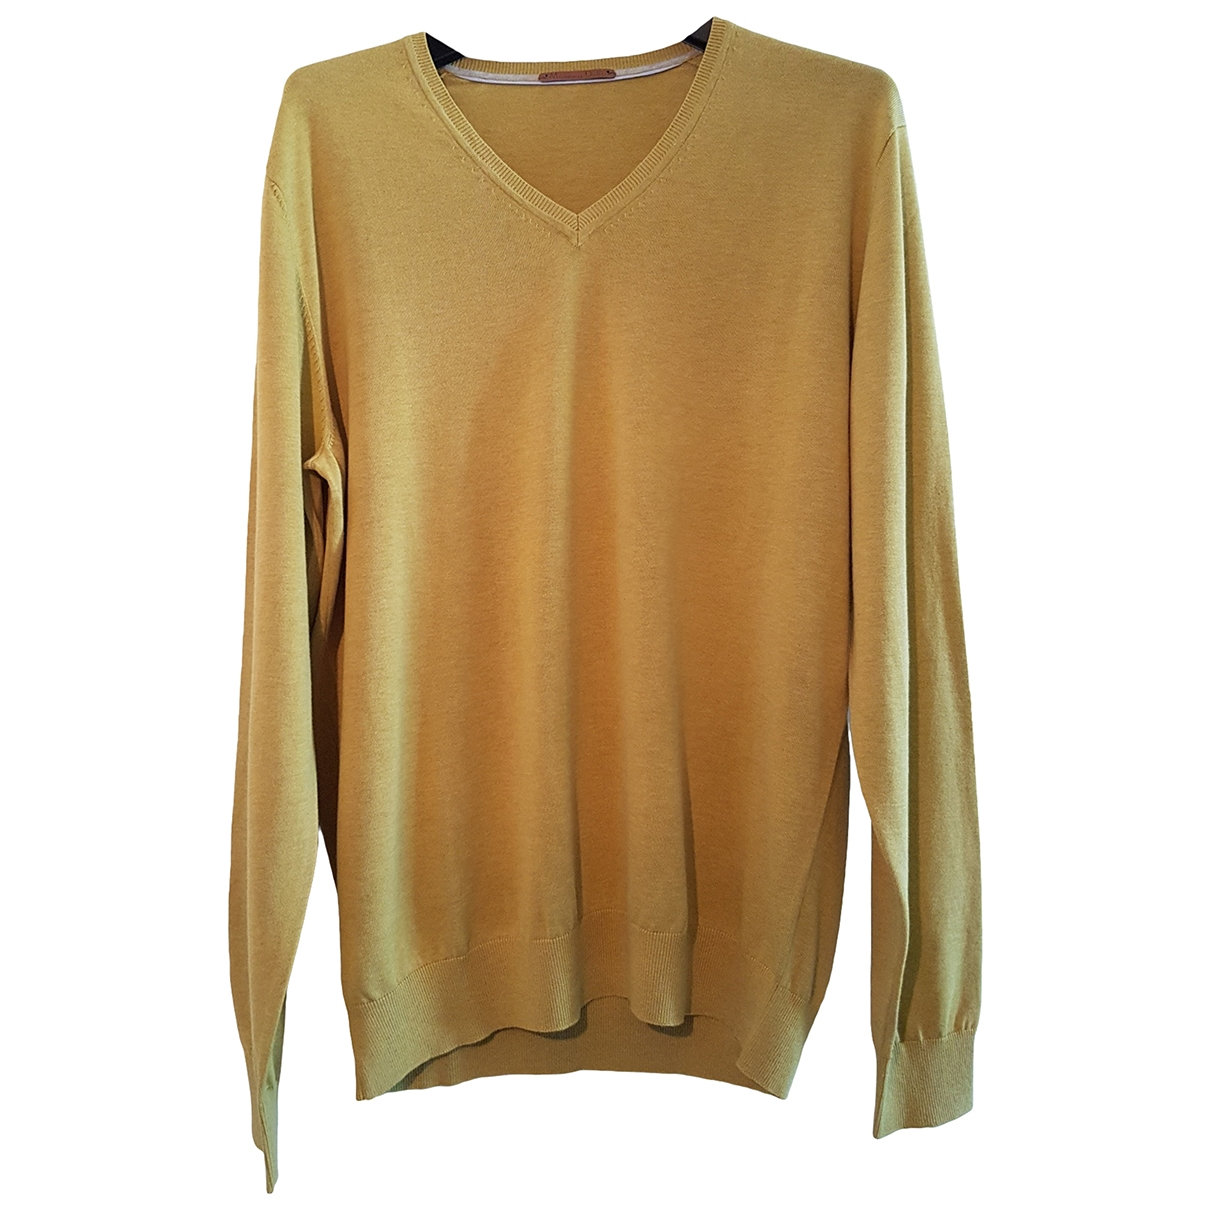 Massimo Dutti \N Khaki Cotton Knitwear & Sweatshirts for Men L International